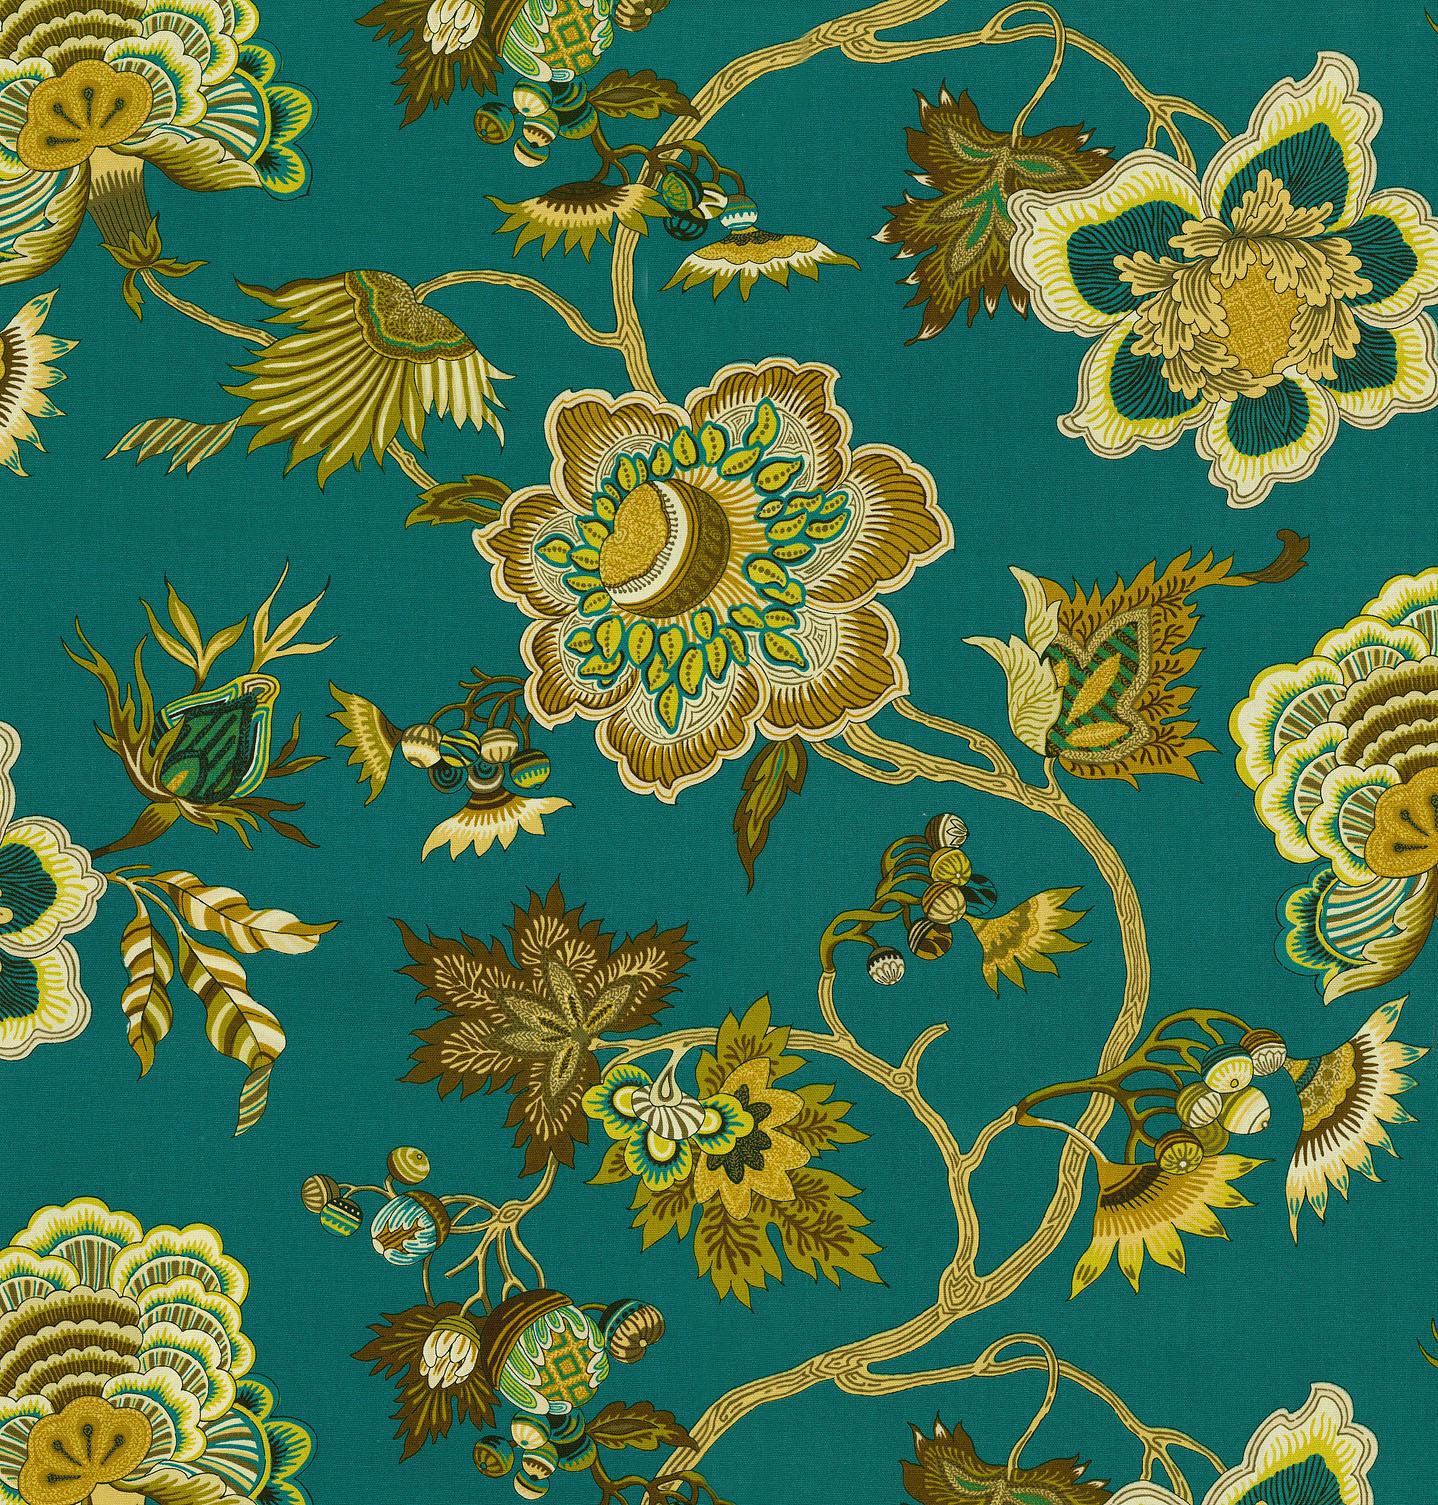 Home Decor Print Fabric Iman Samoan Plantation Jasper Joann